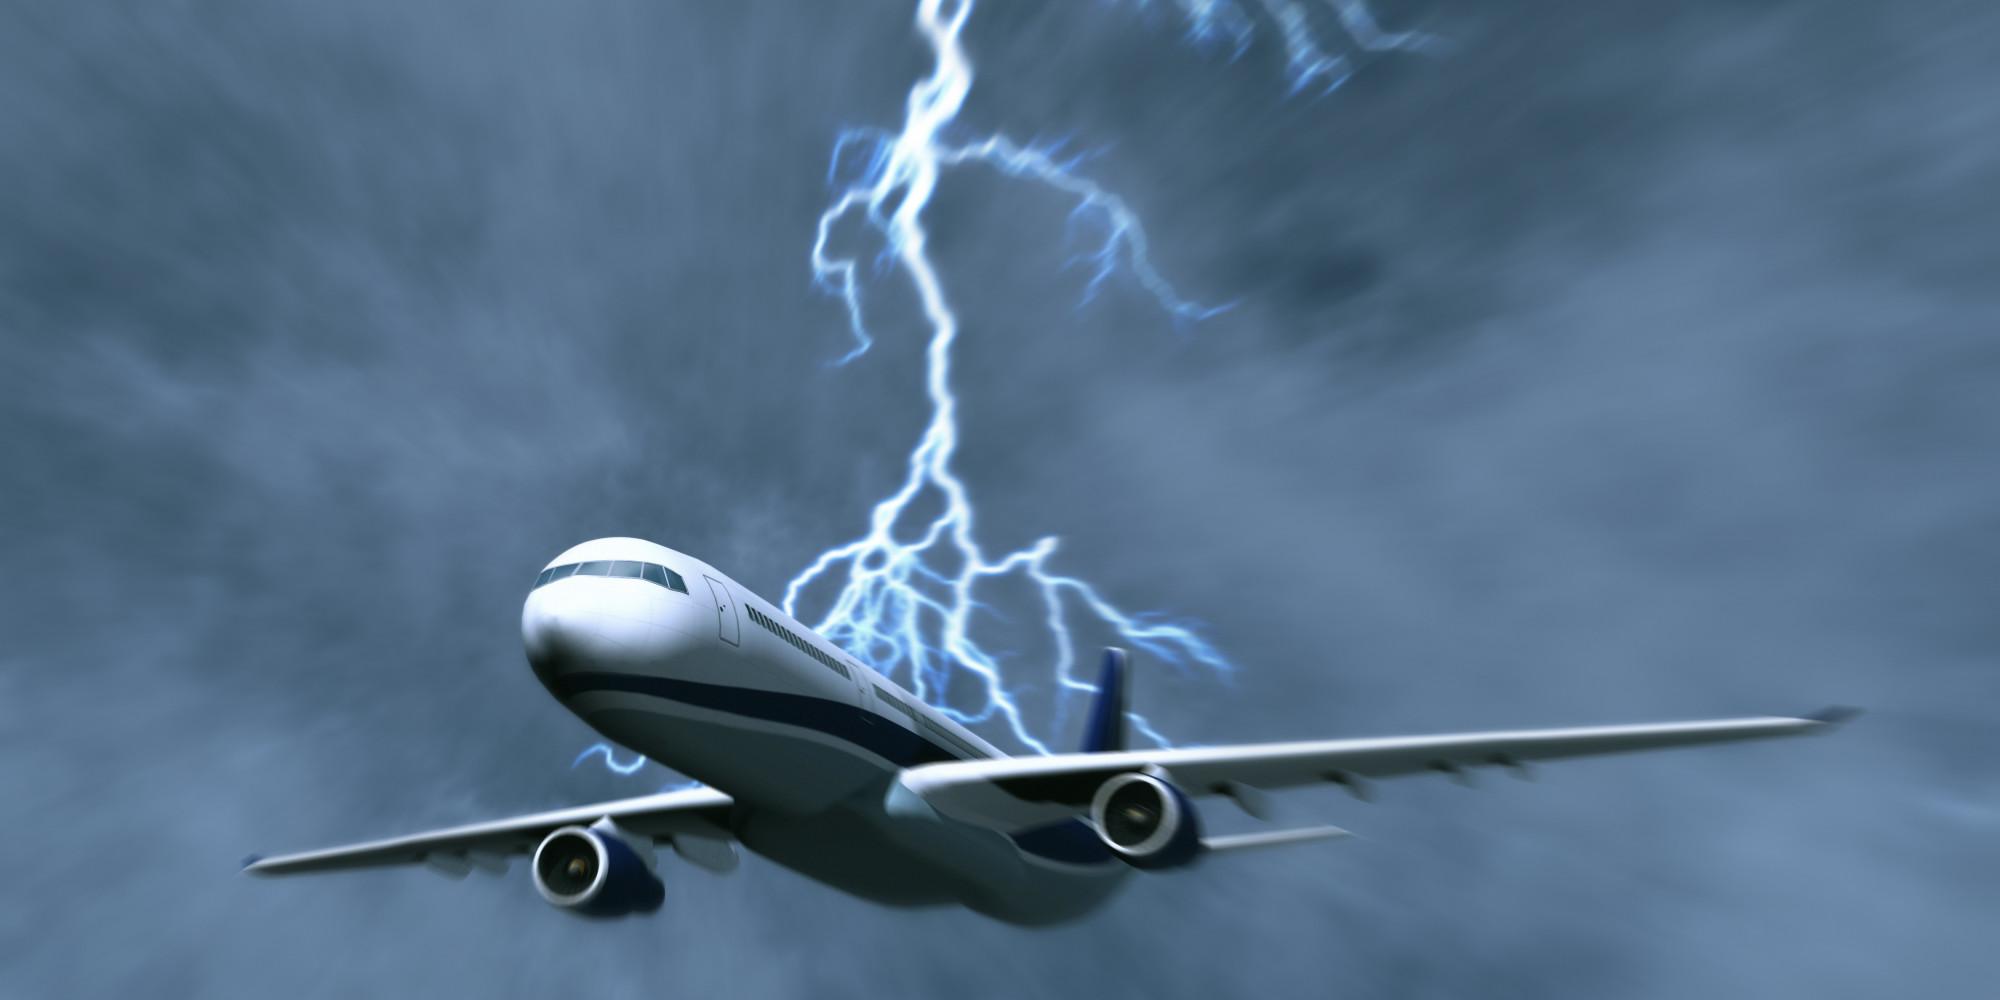 letadlo bouře